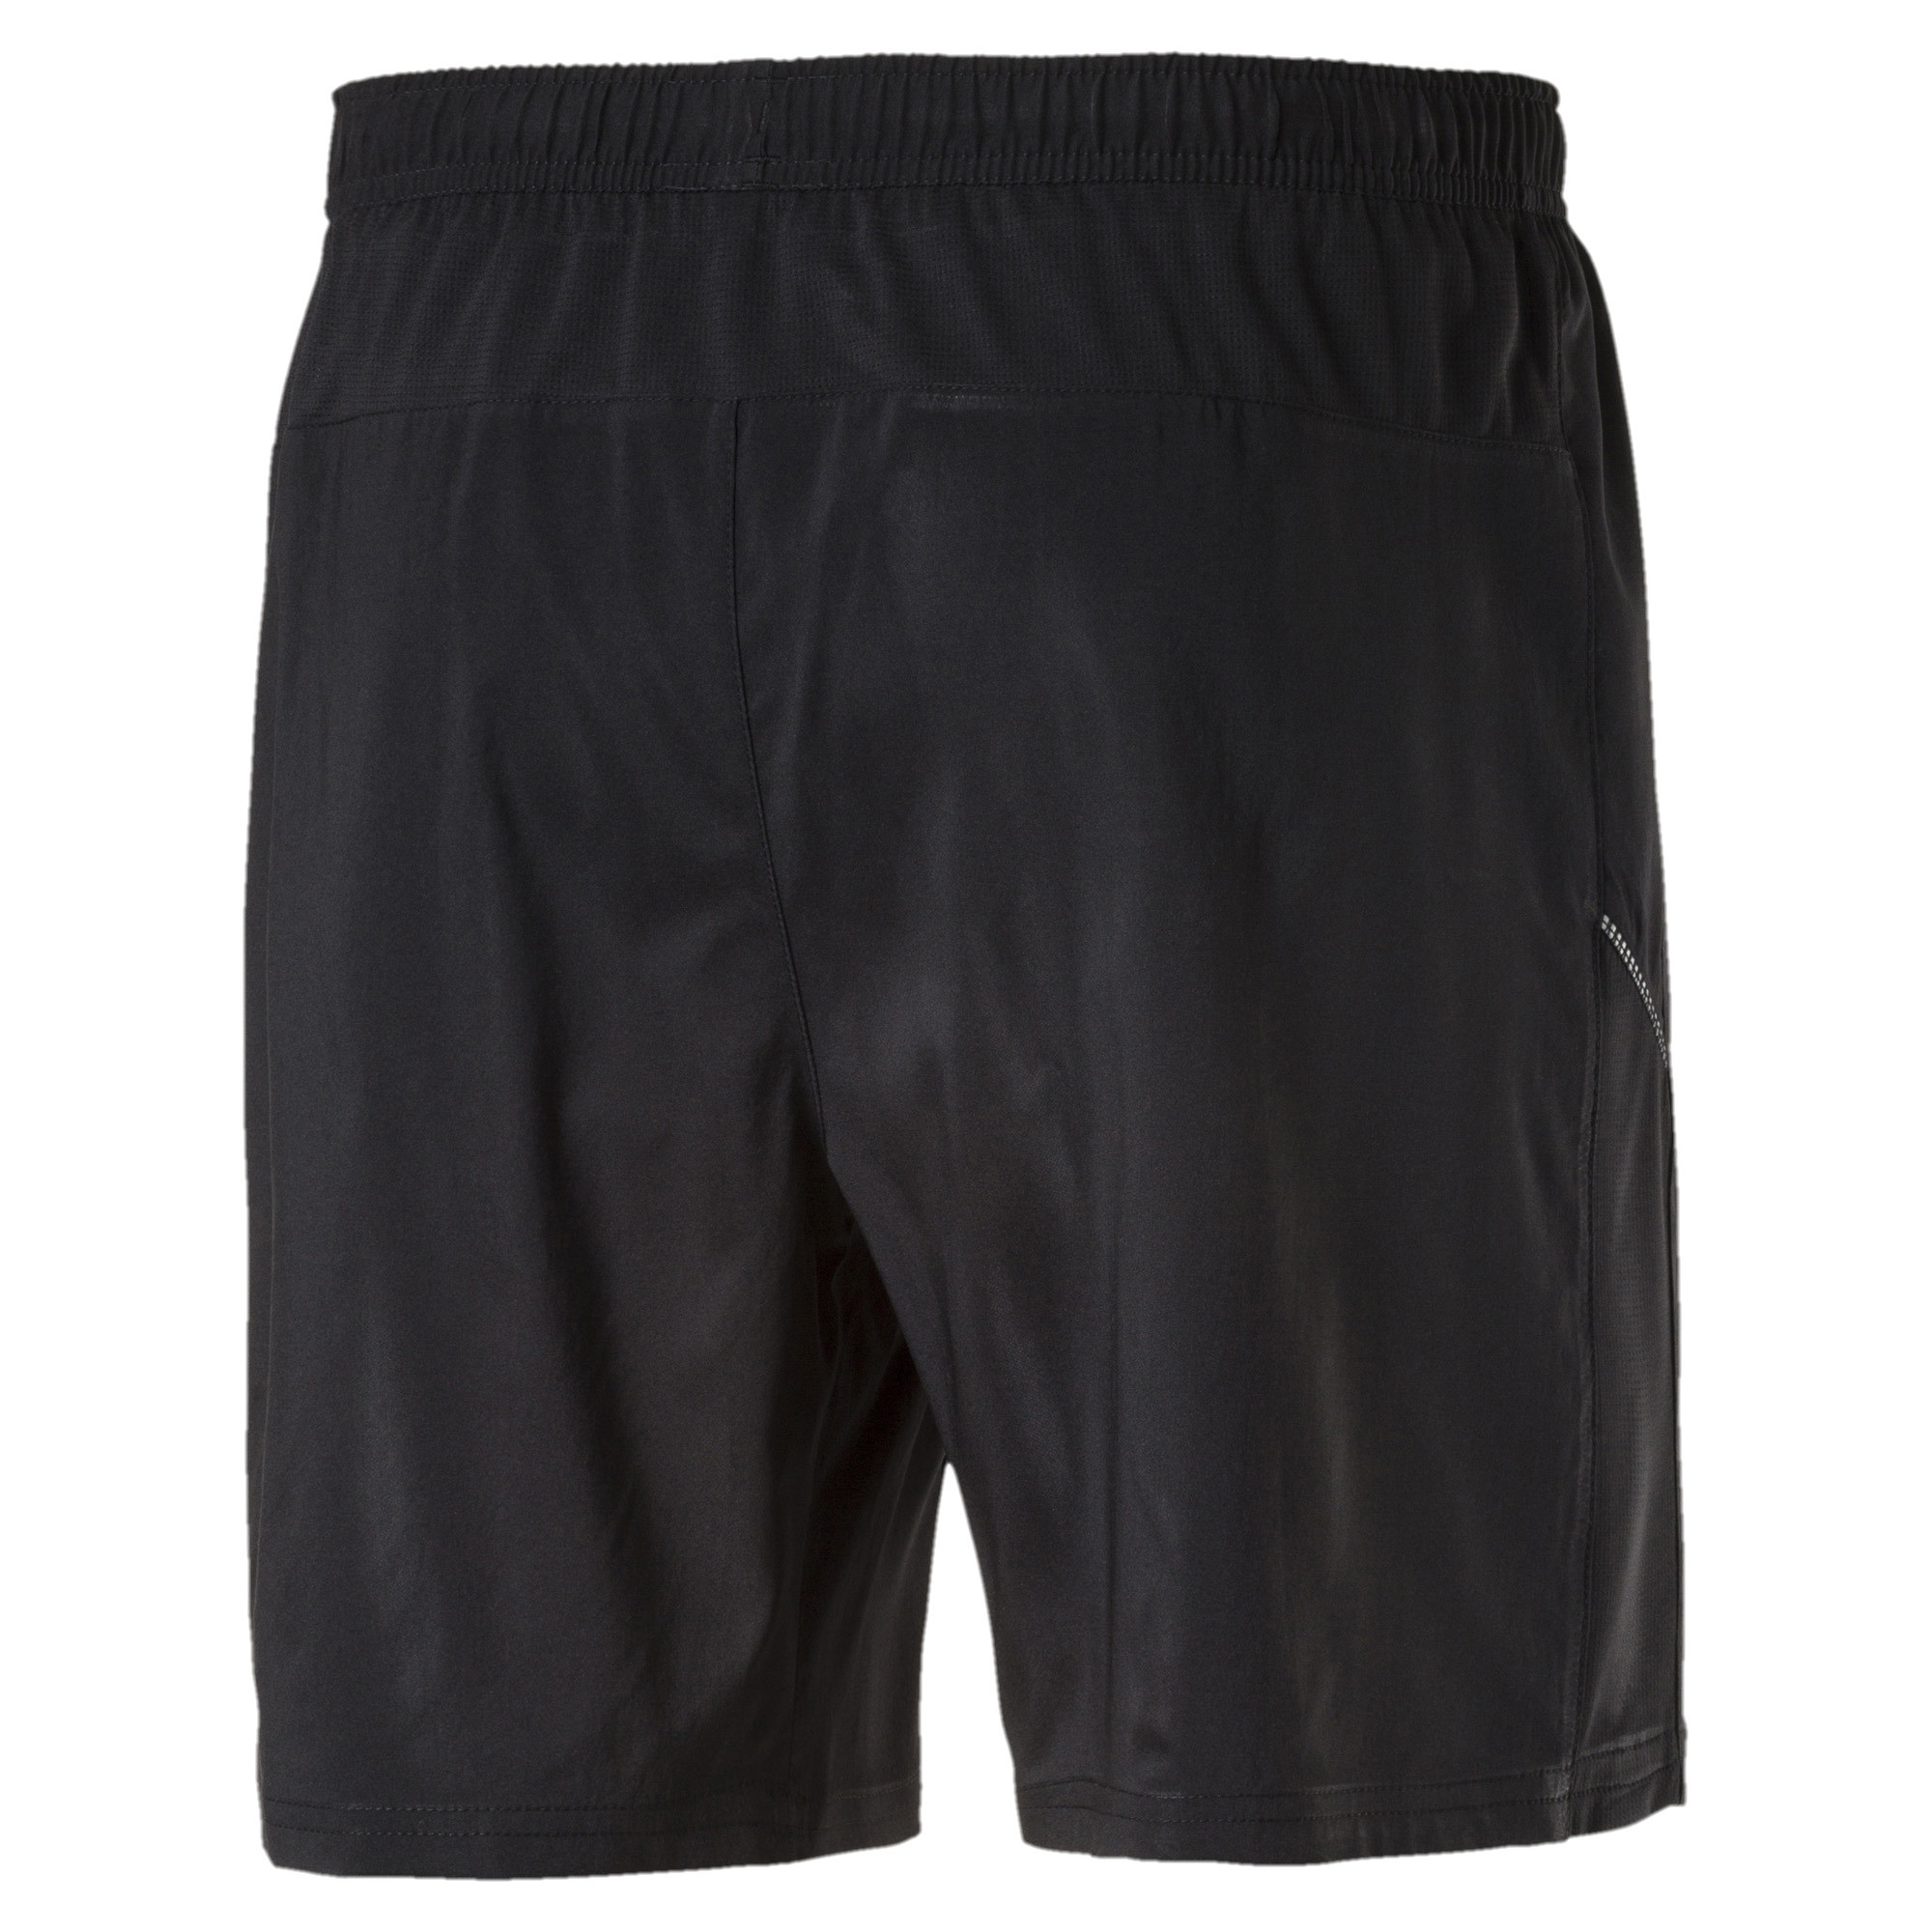 Image Puma Running Men's Shorts #2